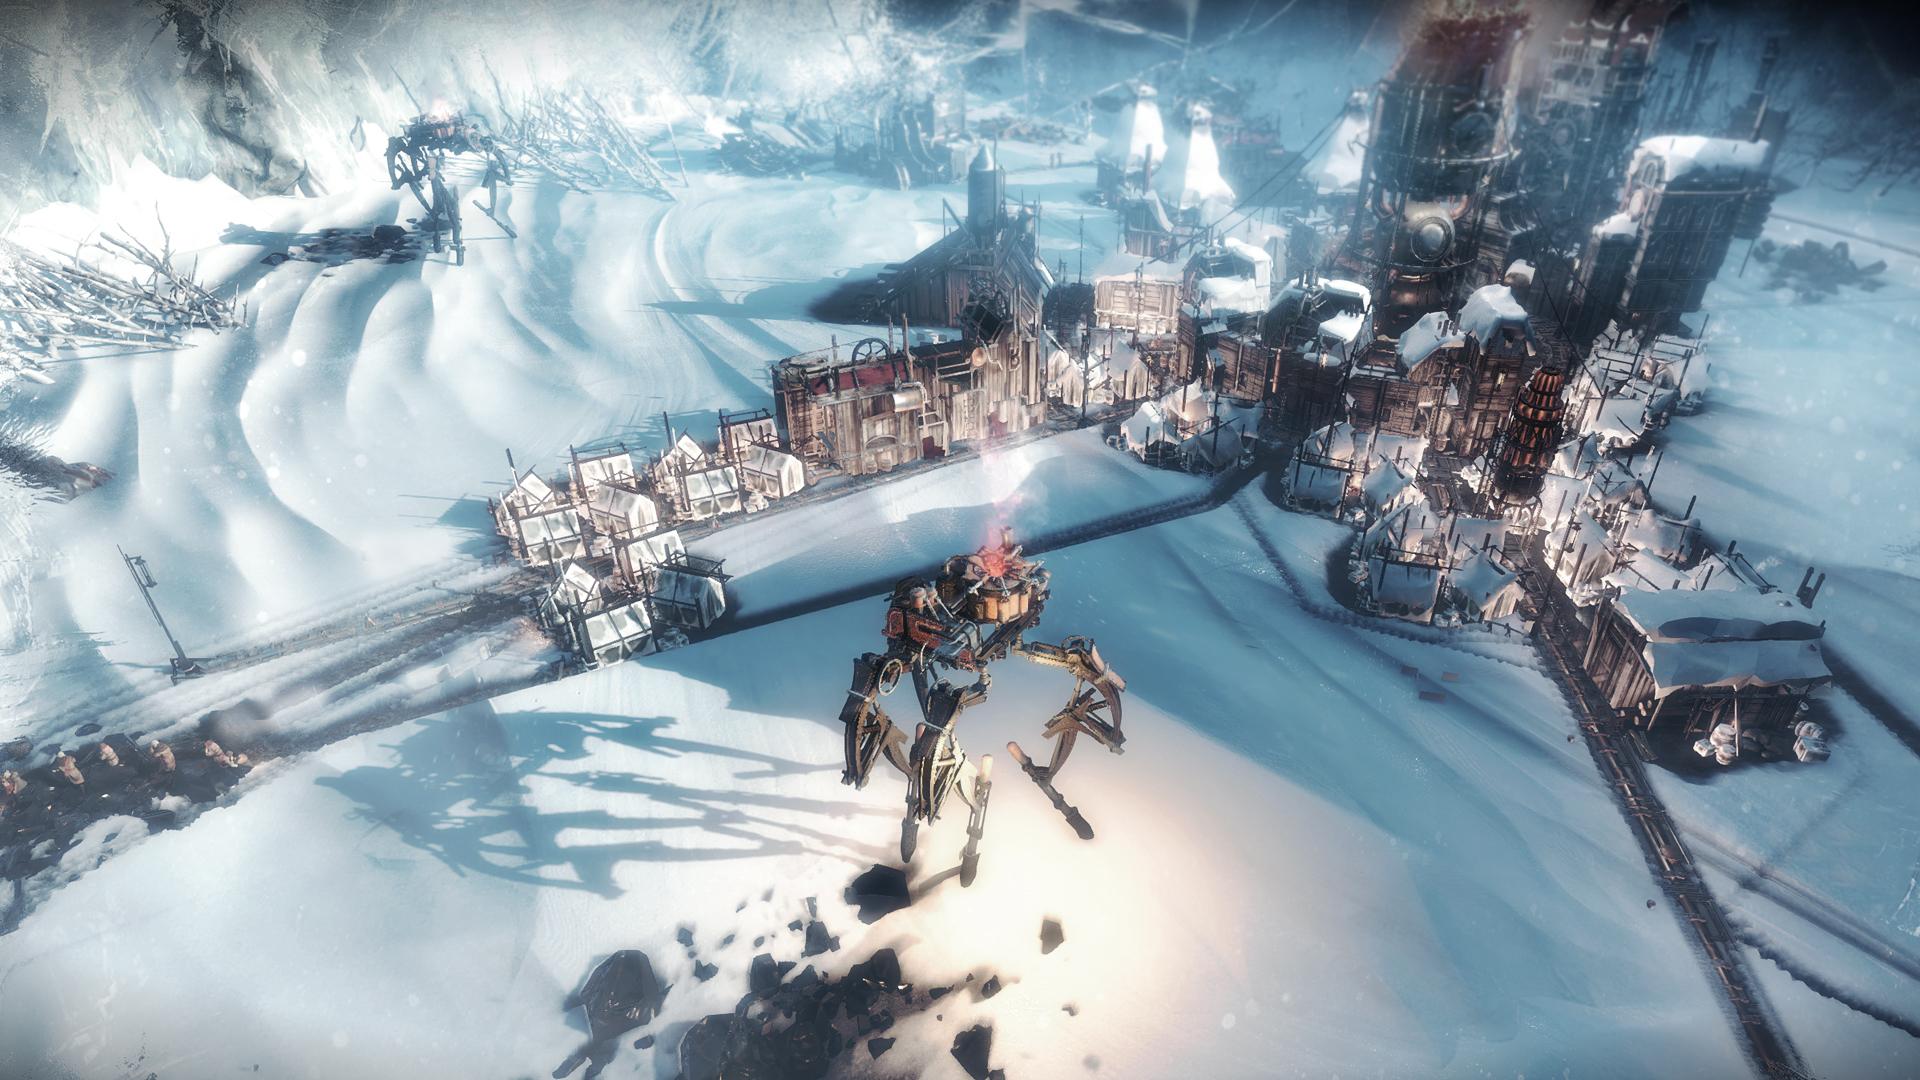 Frostpunk unleashes terrifyingly helpful automatons upon populace screenshot